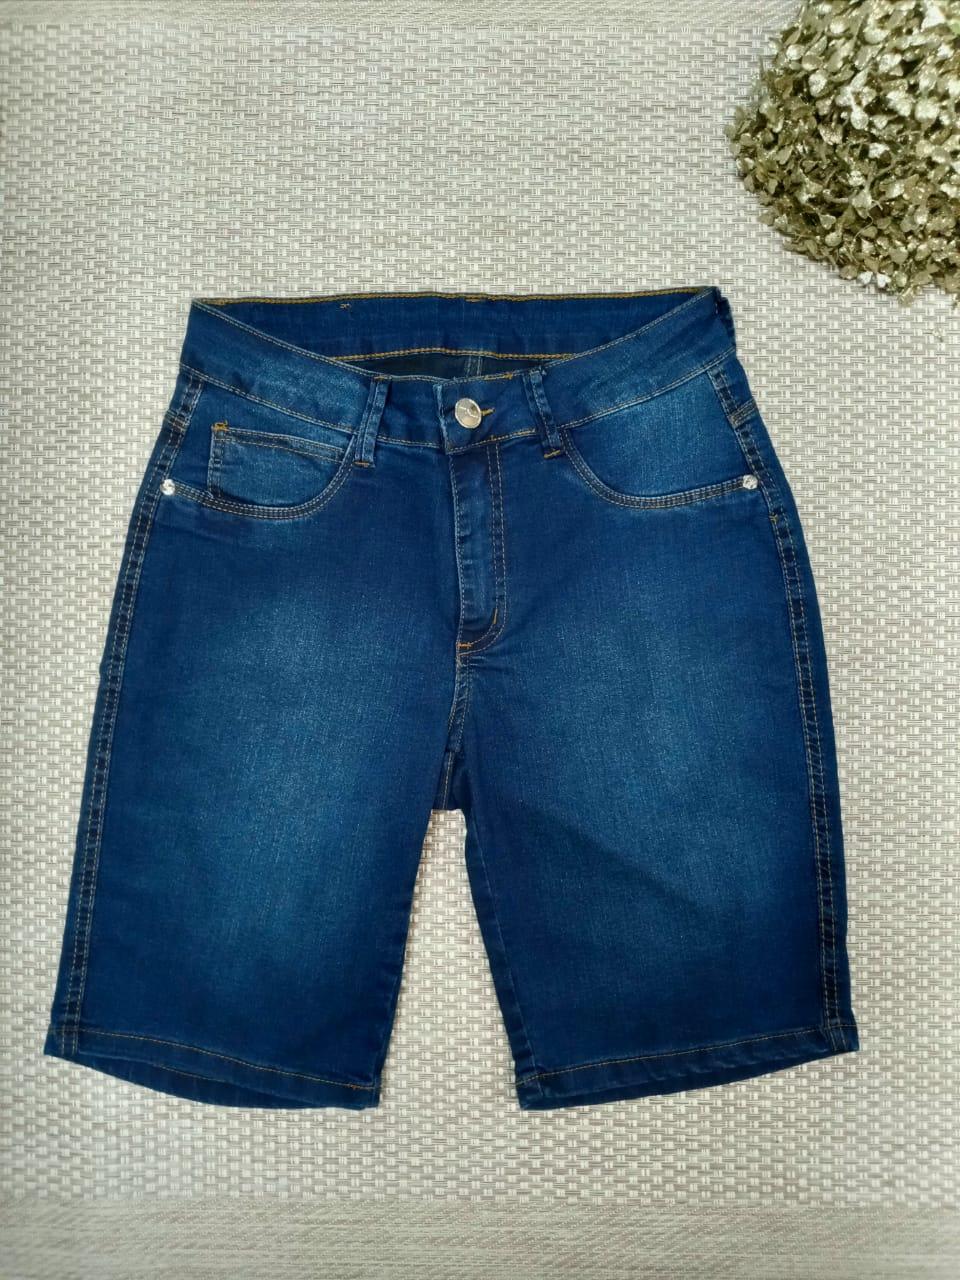 Bermuda Jeans - Gina